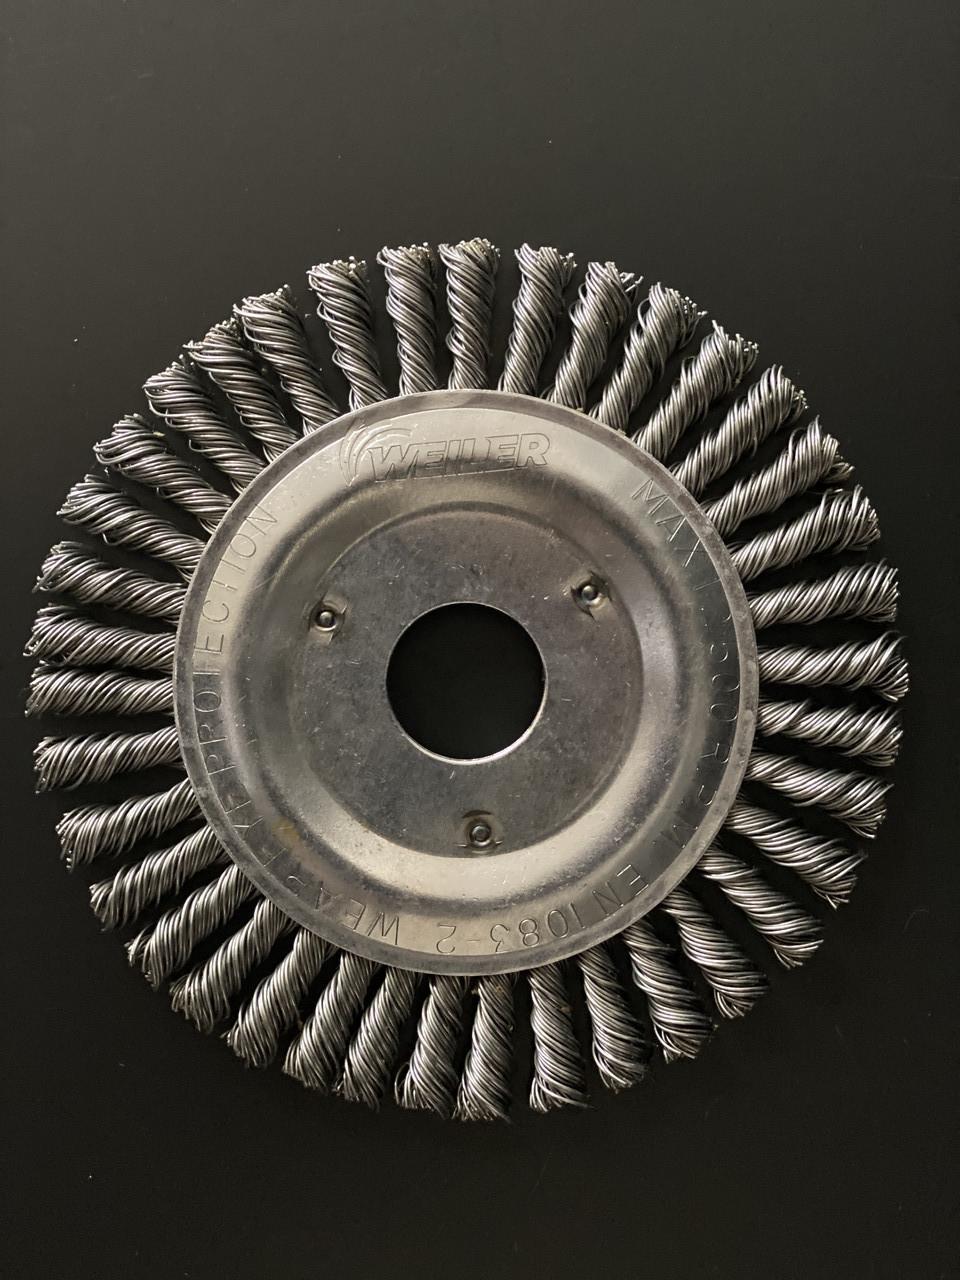 Щётка дисковая D 125 x 6 x 22,2 mm. Weiler Жгутовая стальная проволока 0,5mm